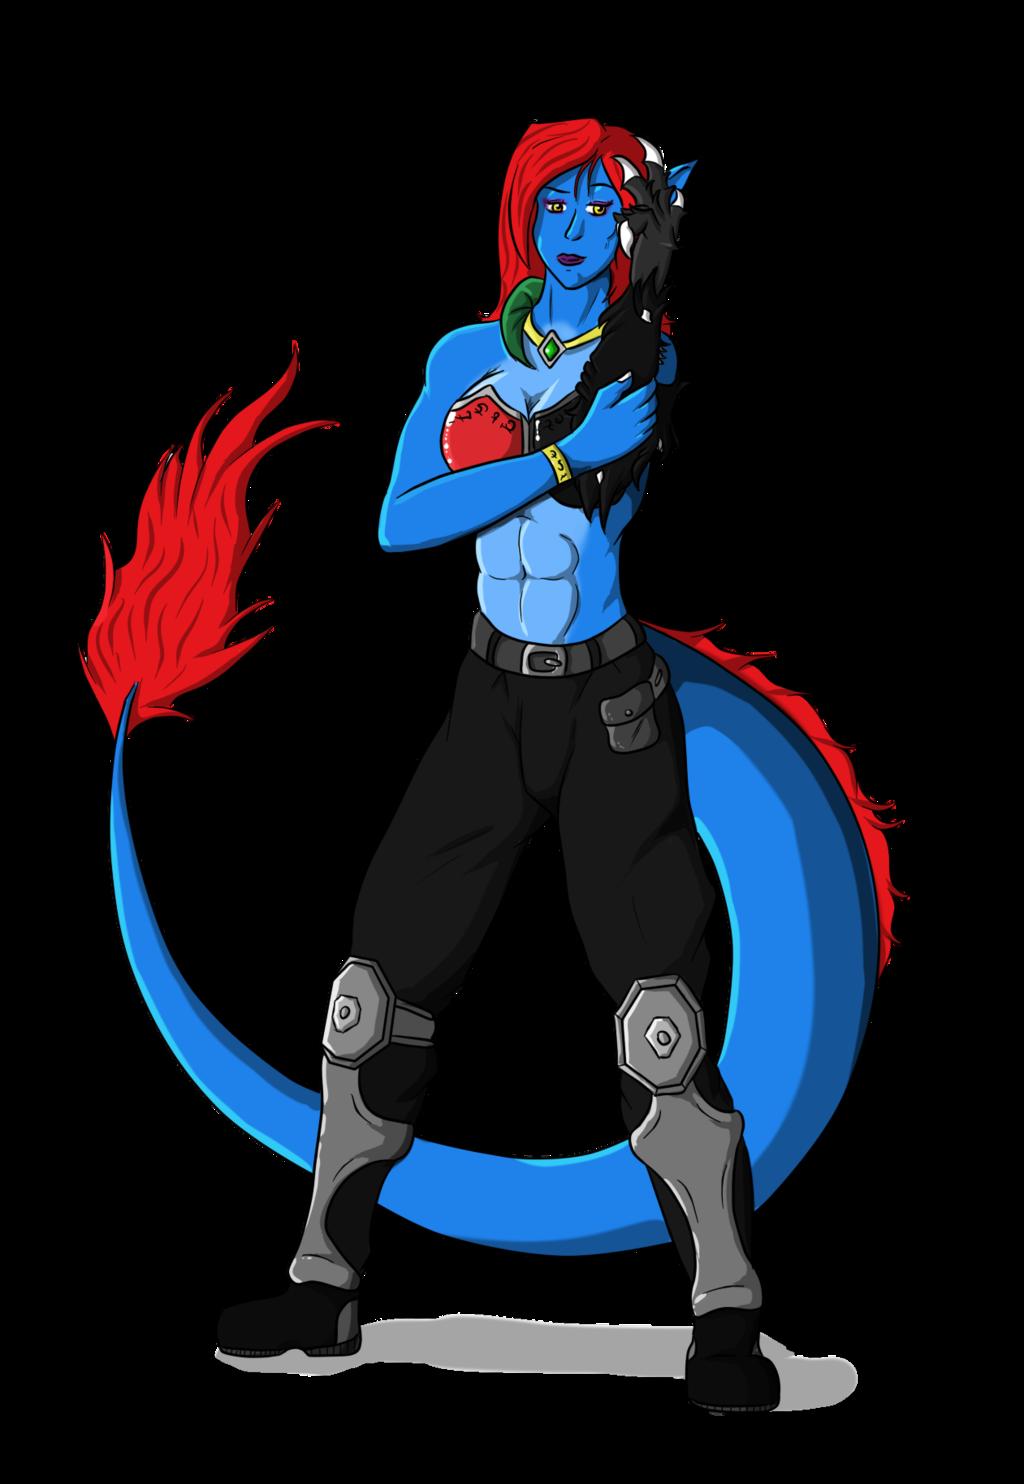 Kalinda in wrestling attire, by Foulfrost